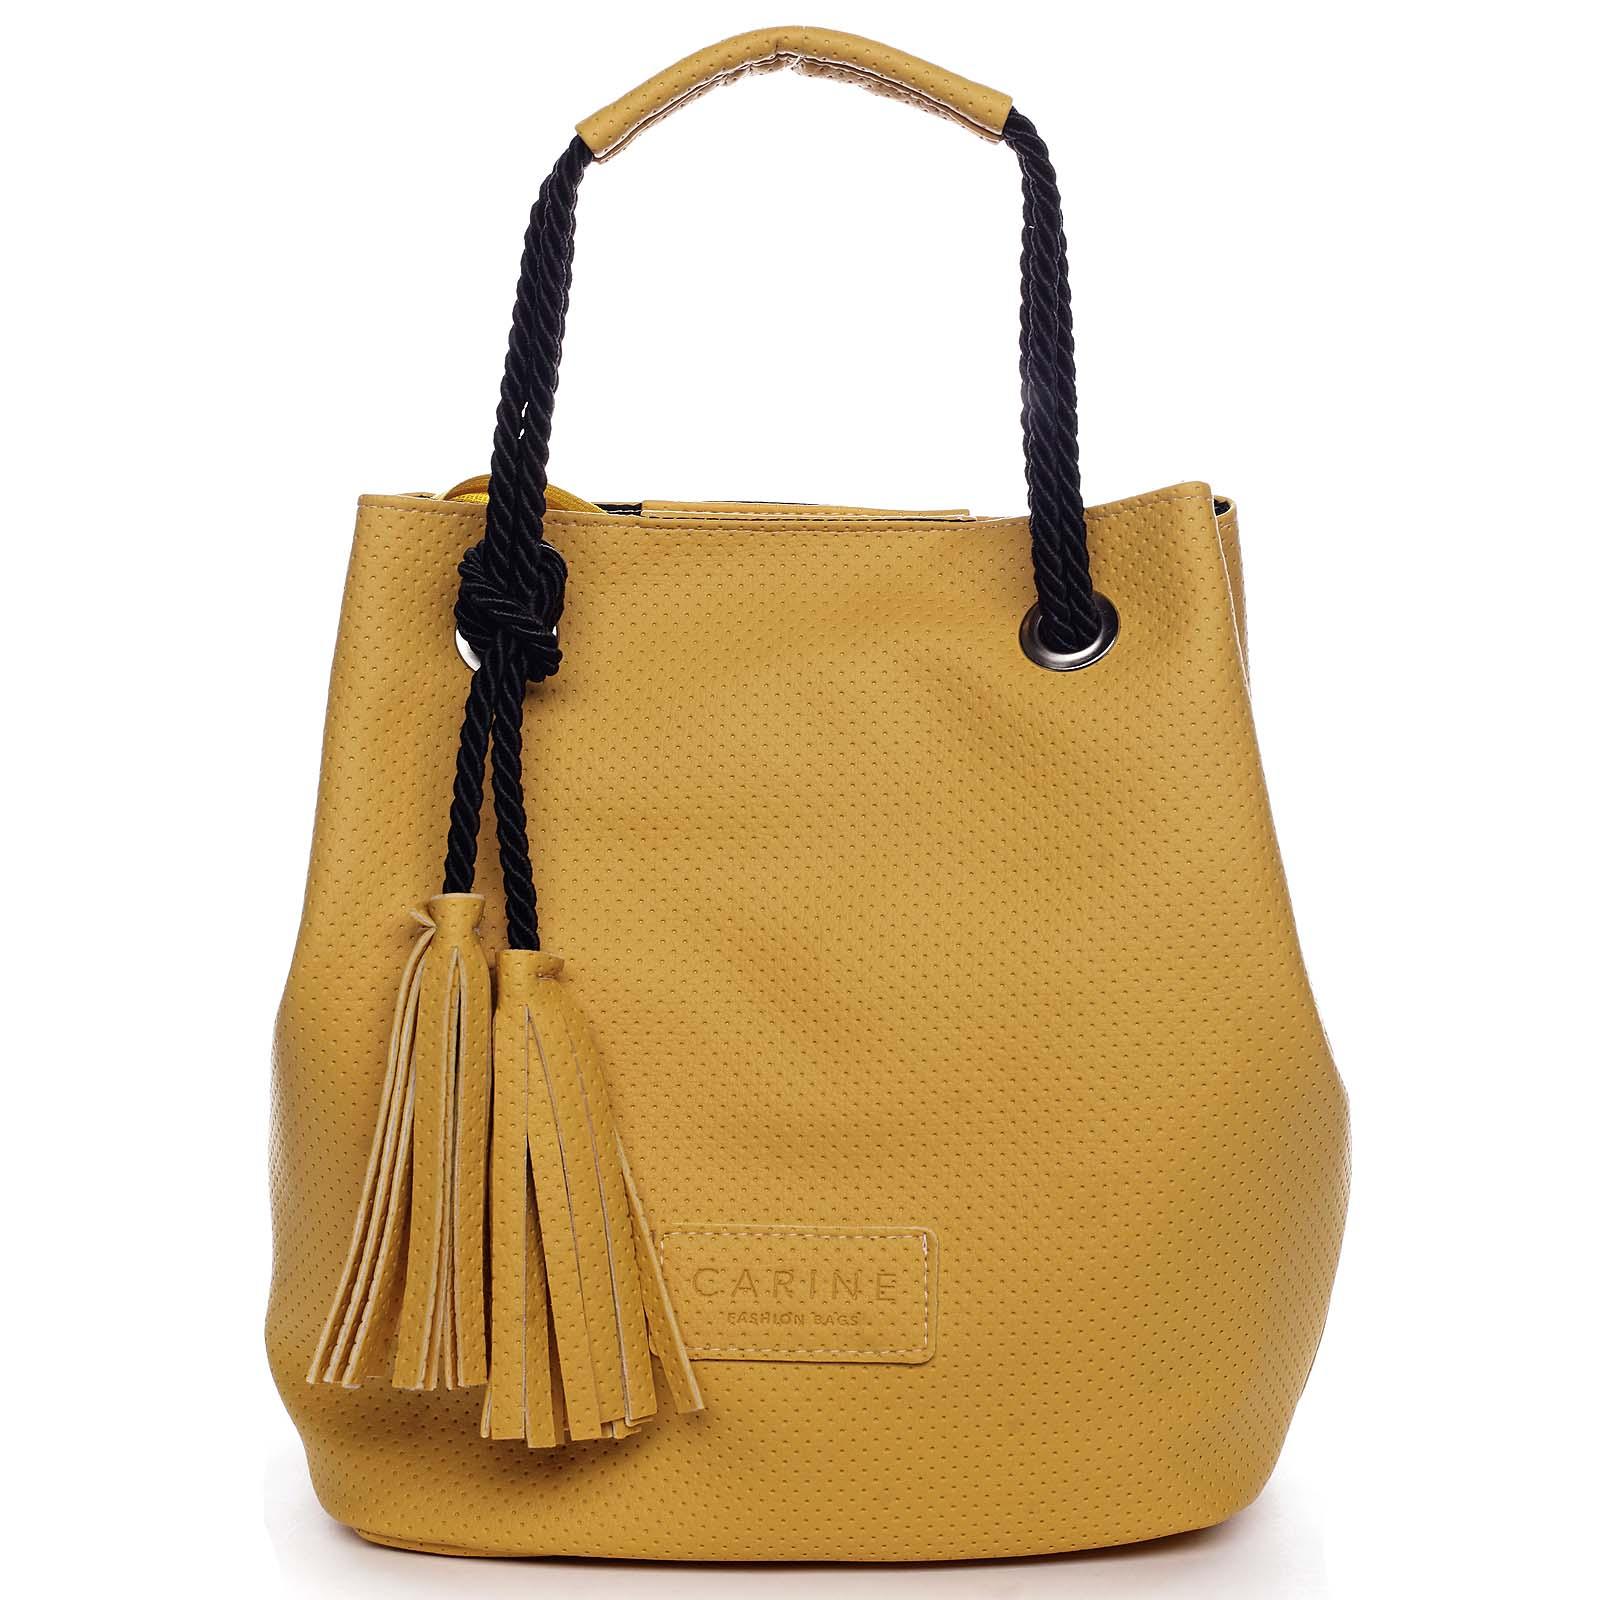 Dámska kabelka žltá - Carine C2000 žltá